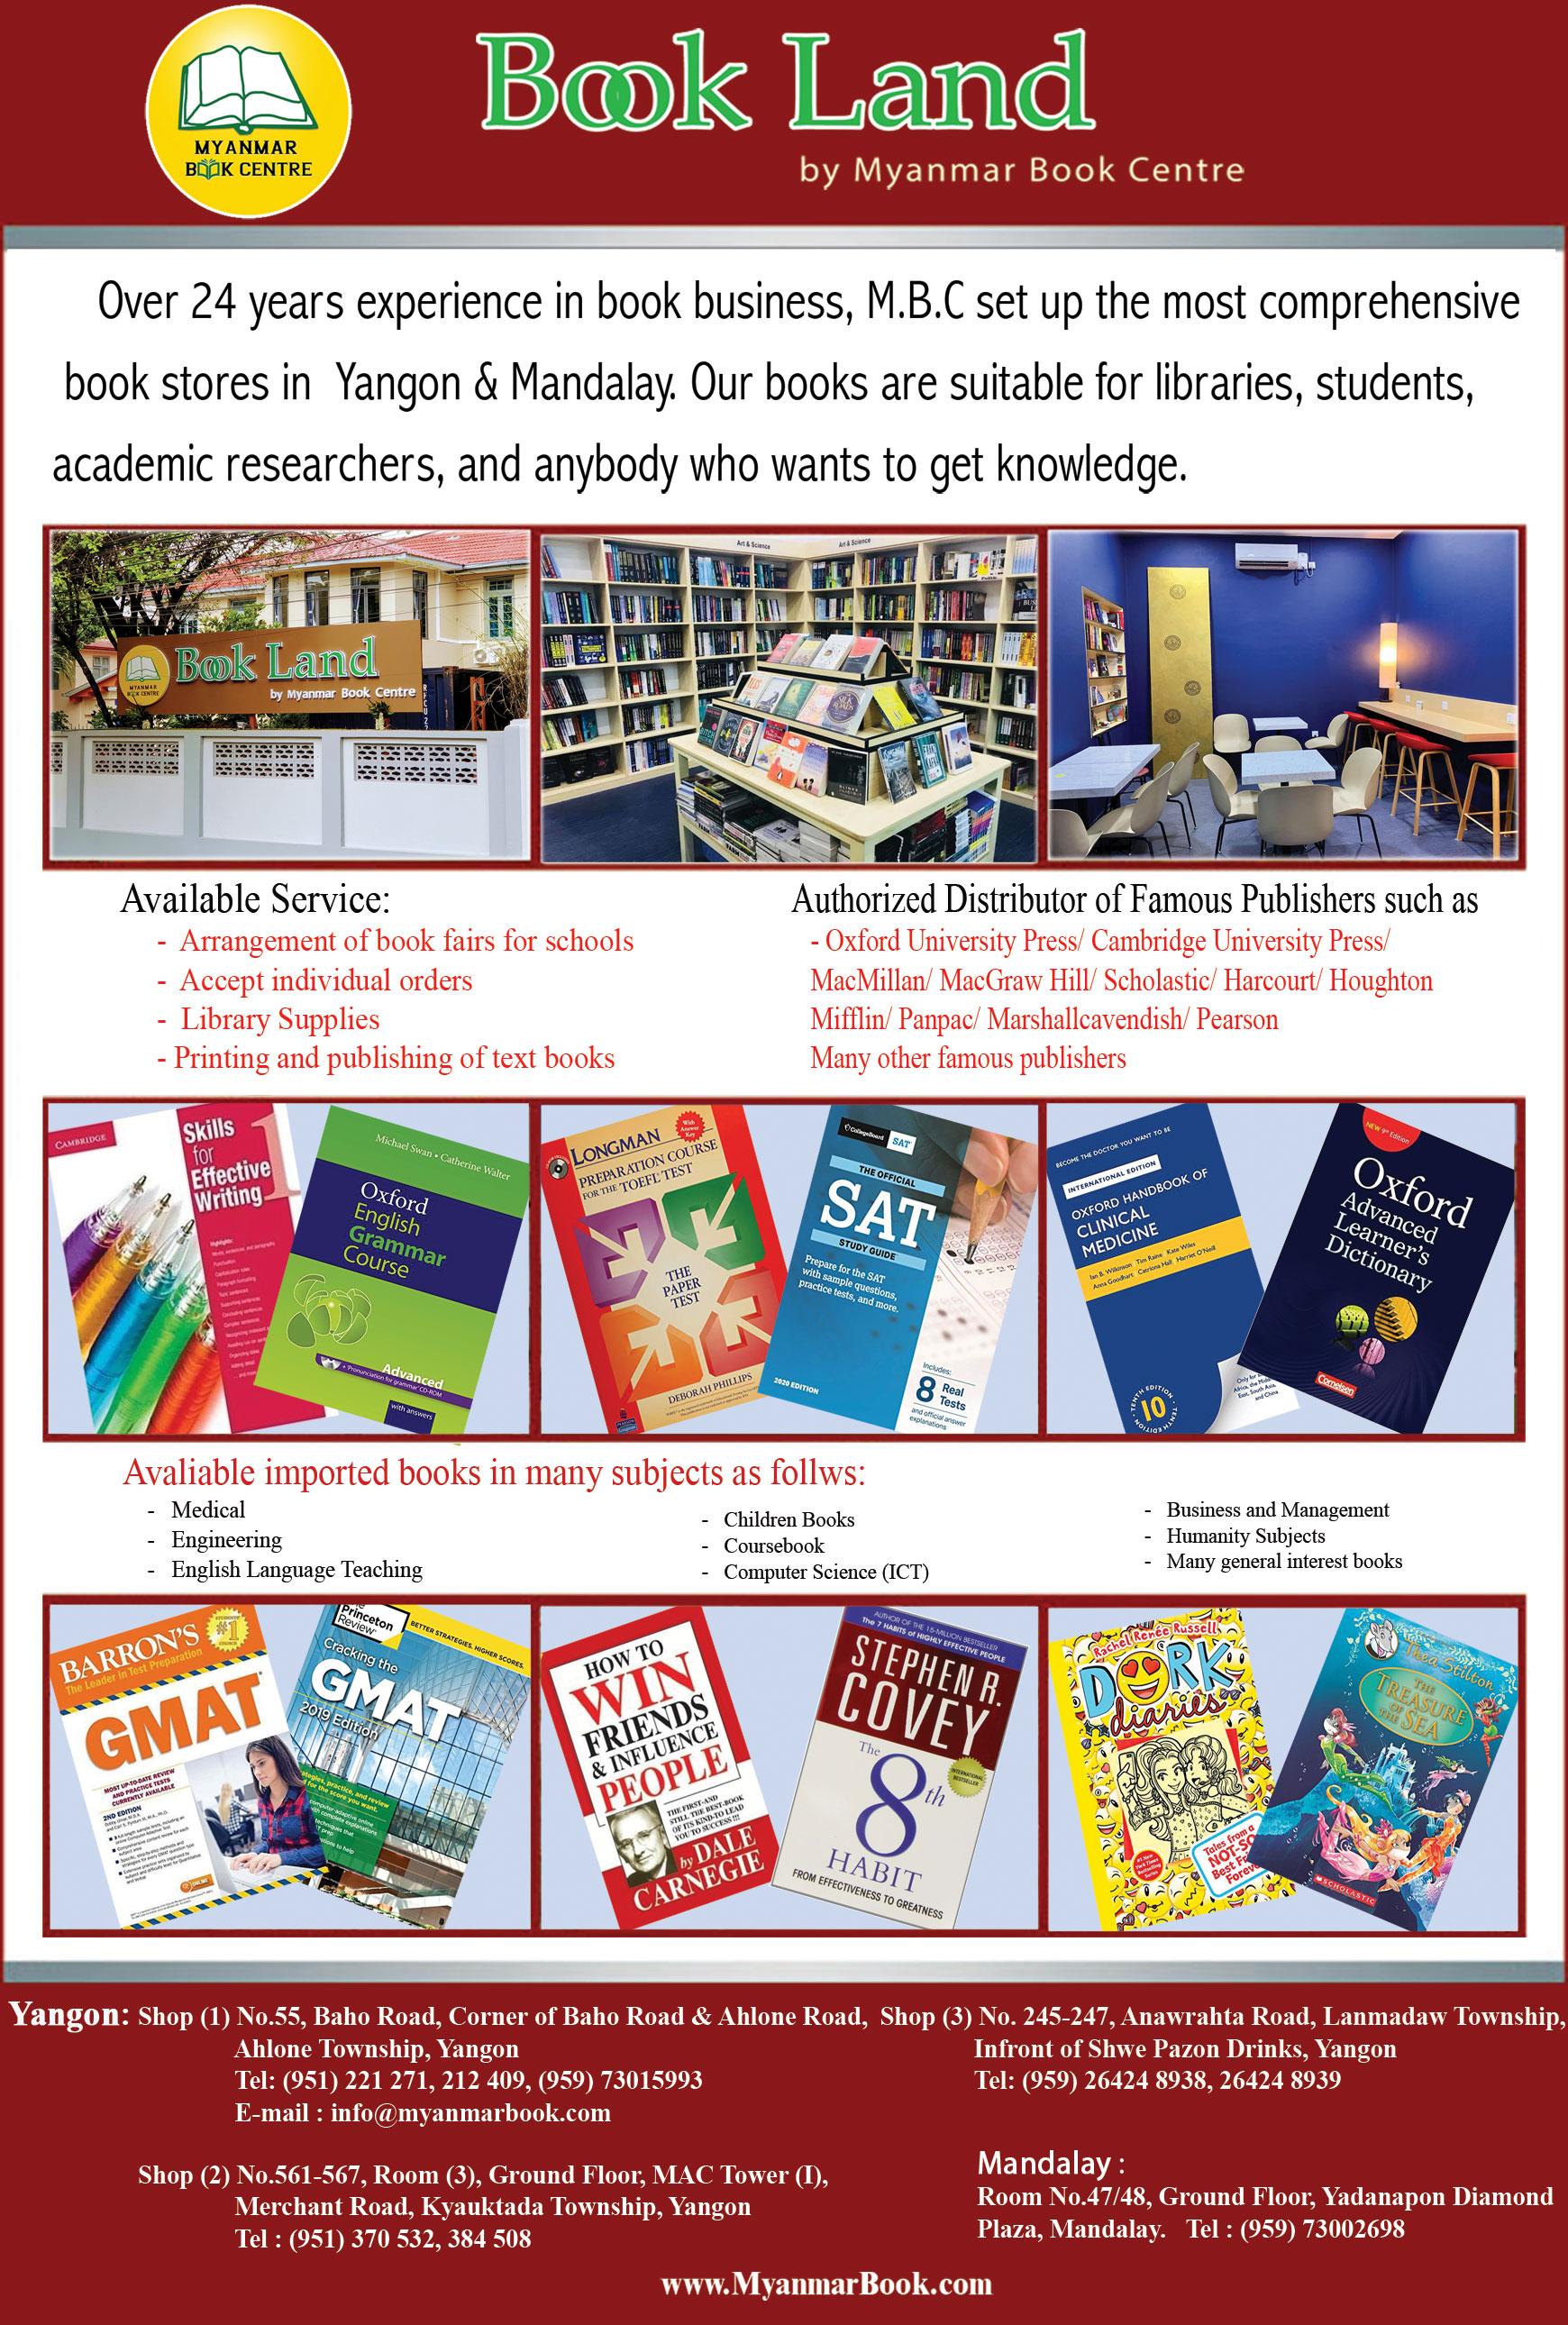 Myanmar-Book-Centre_Bookshops_(A)_38.jpg